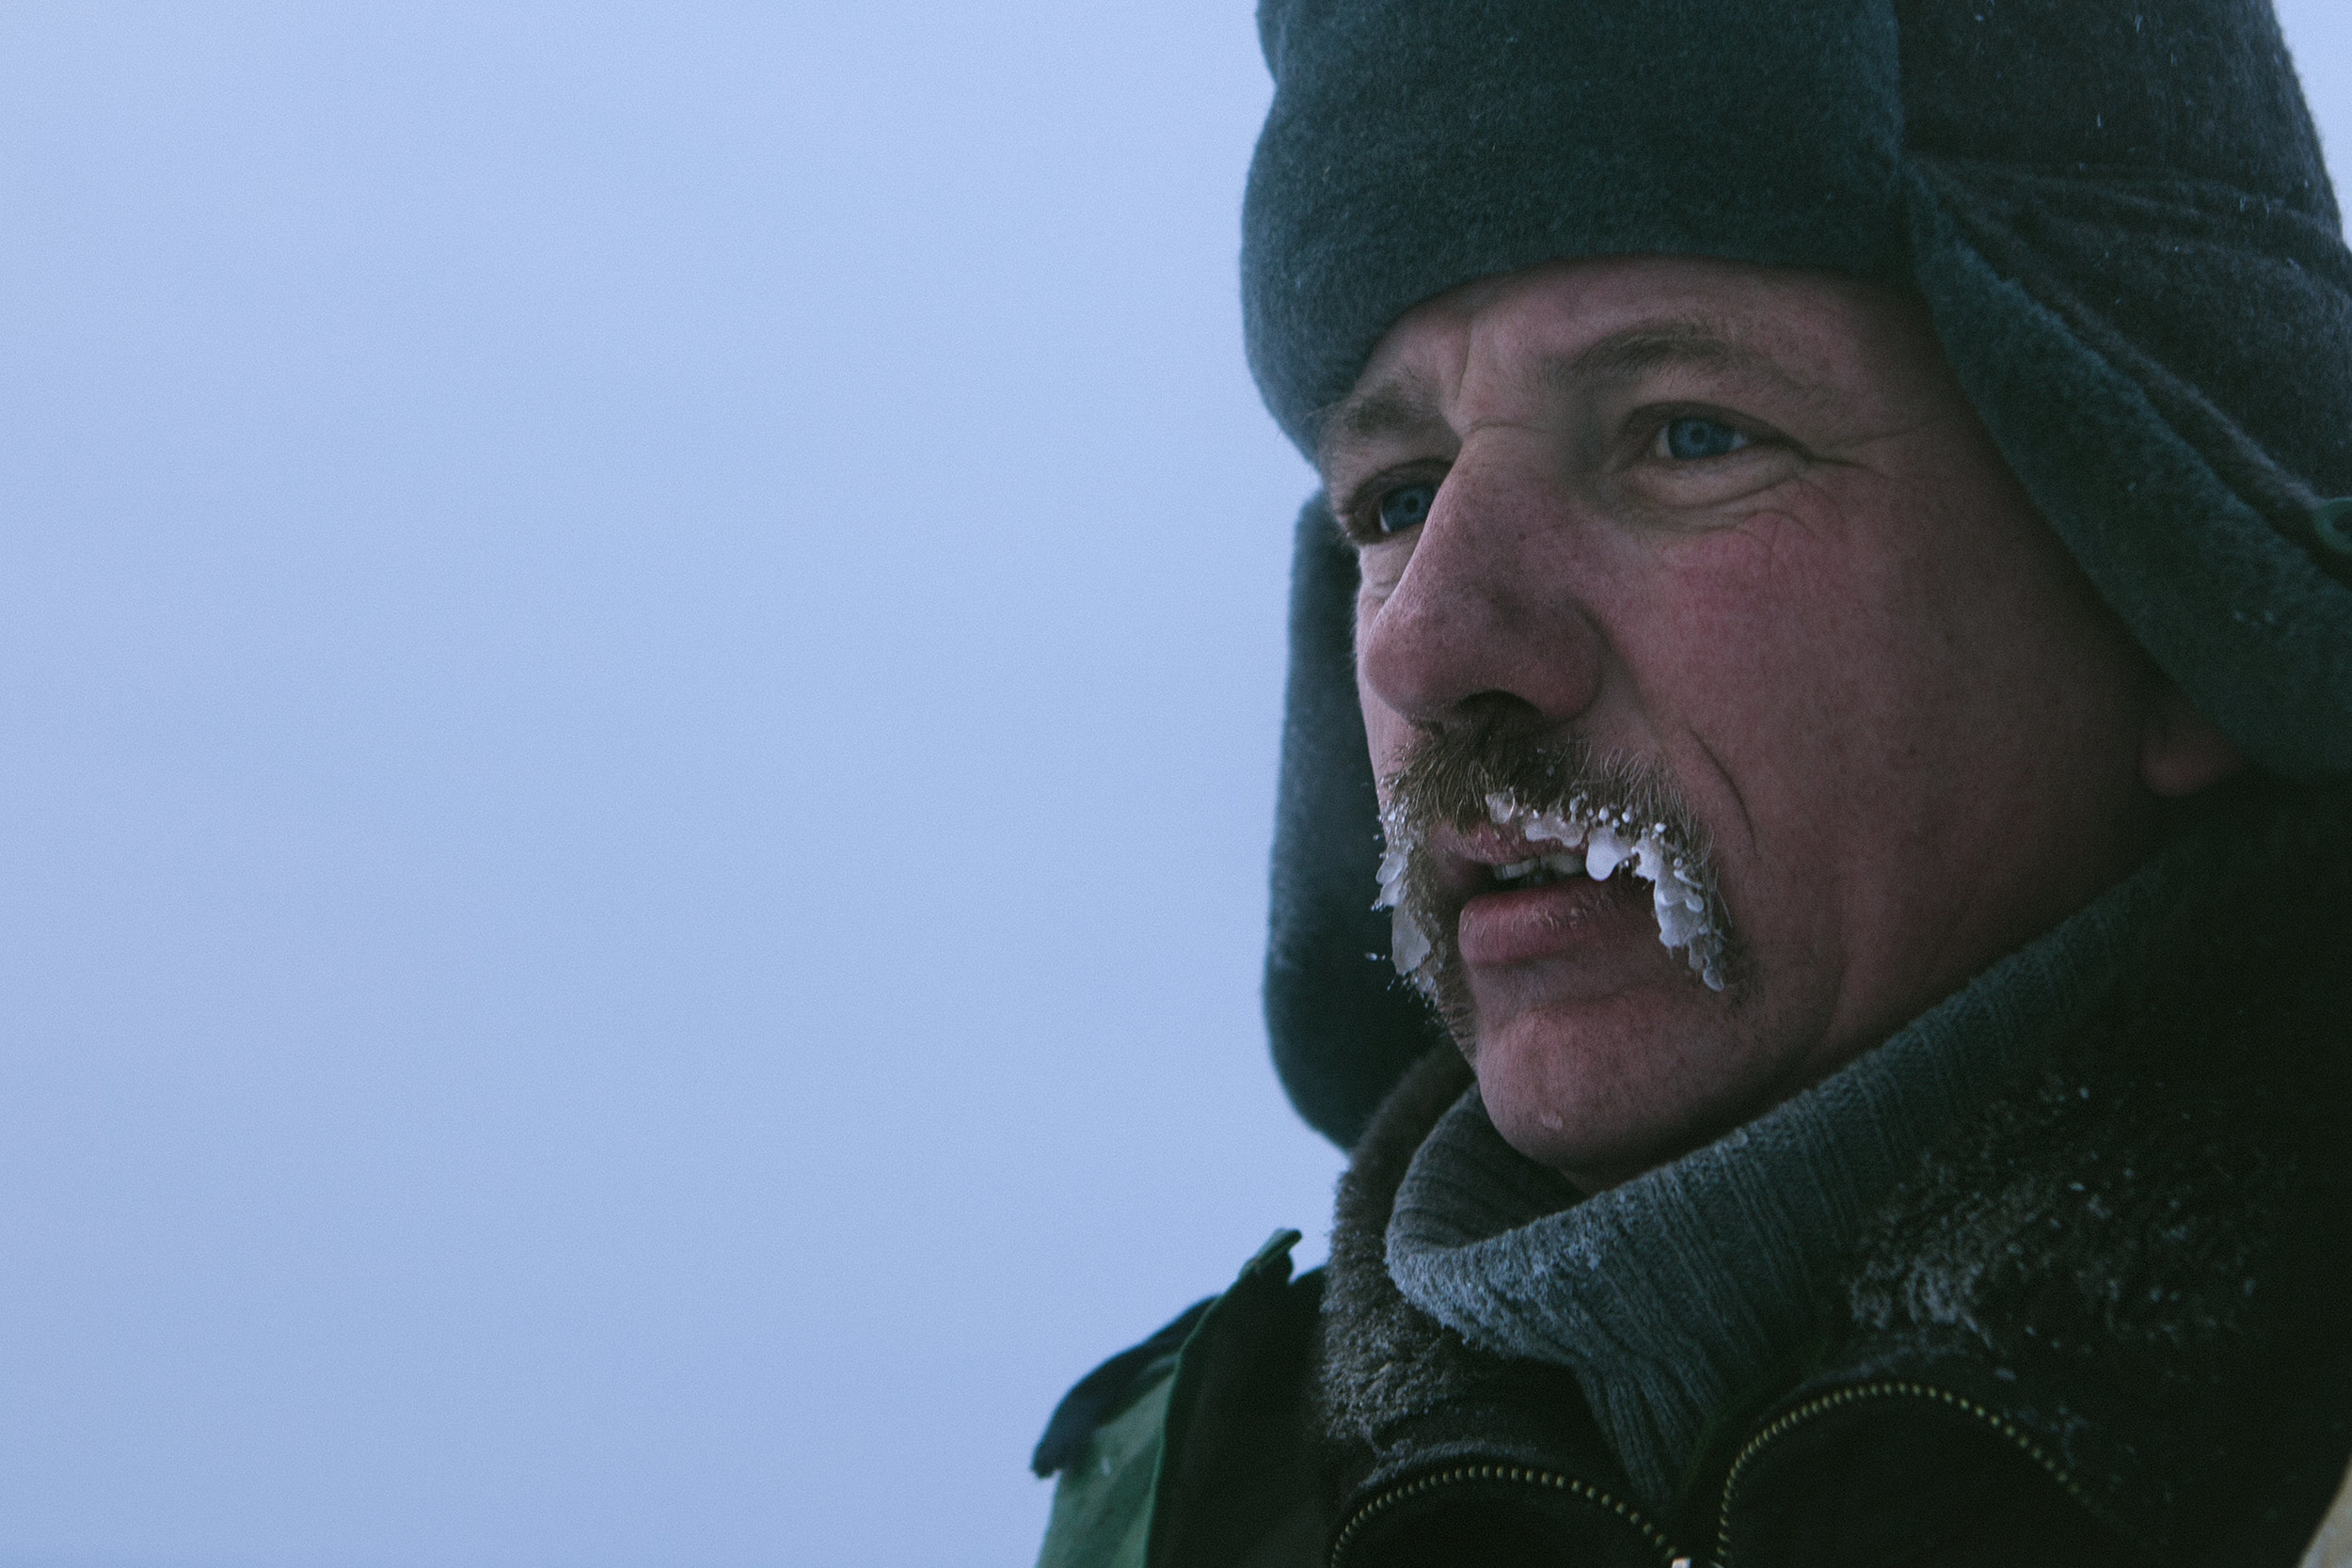 Belarusian fisherman with a frozen moustache